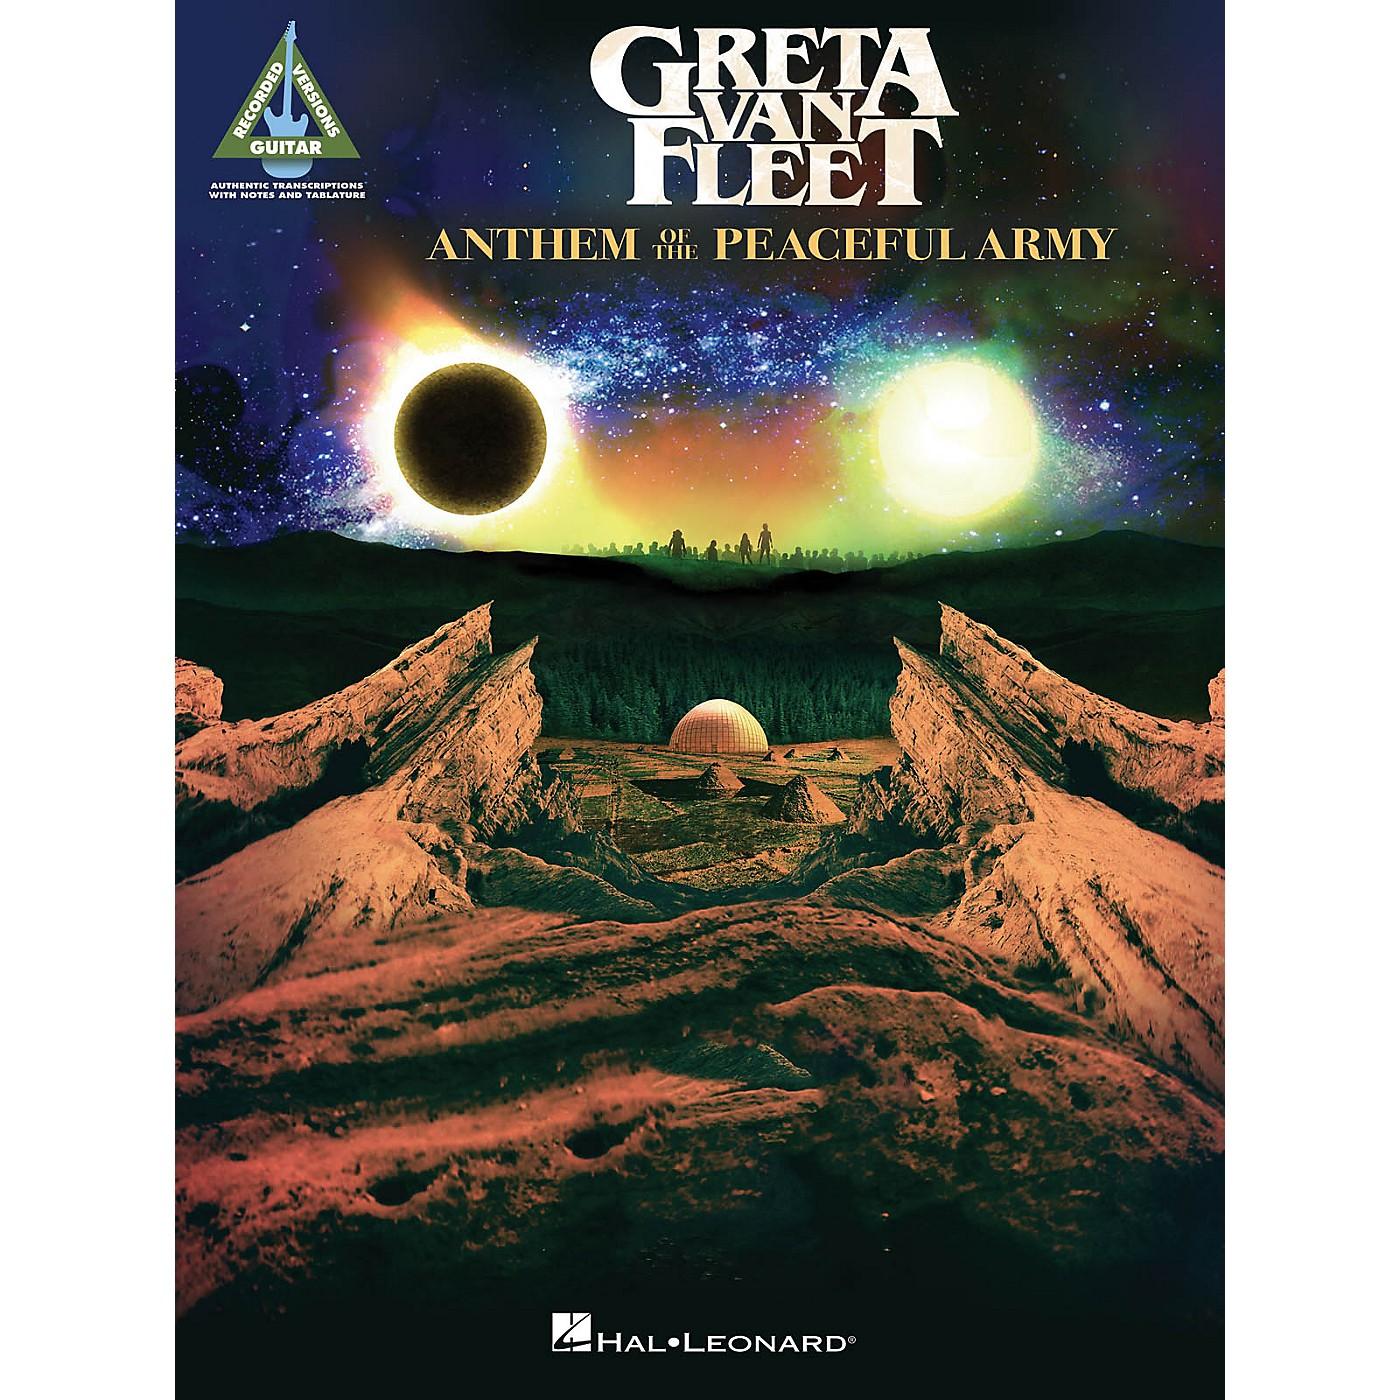 Hal Leonard Greta Van Fleet - Anthem of the Peaceful Army Guitar Tab Songbook thumbnail